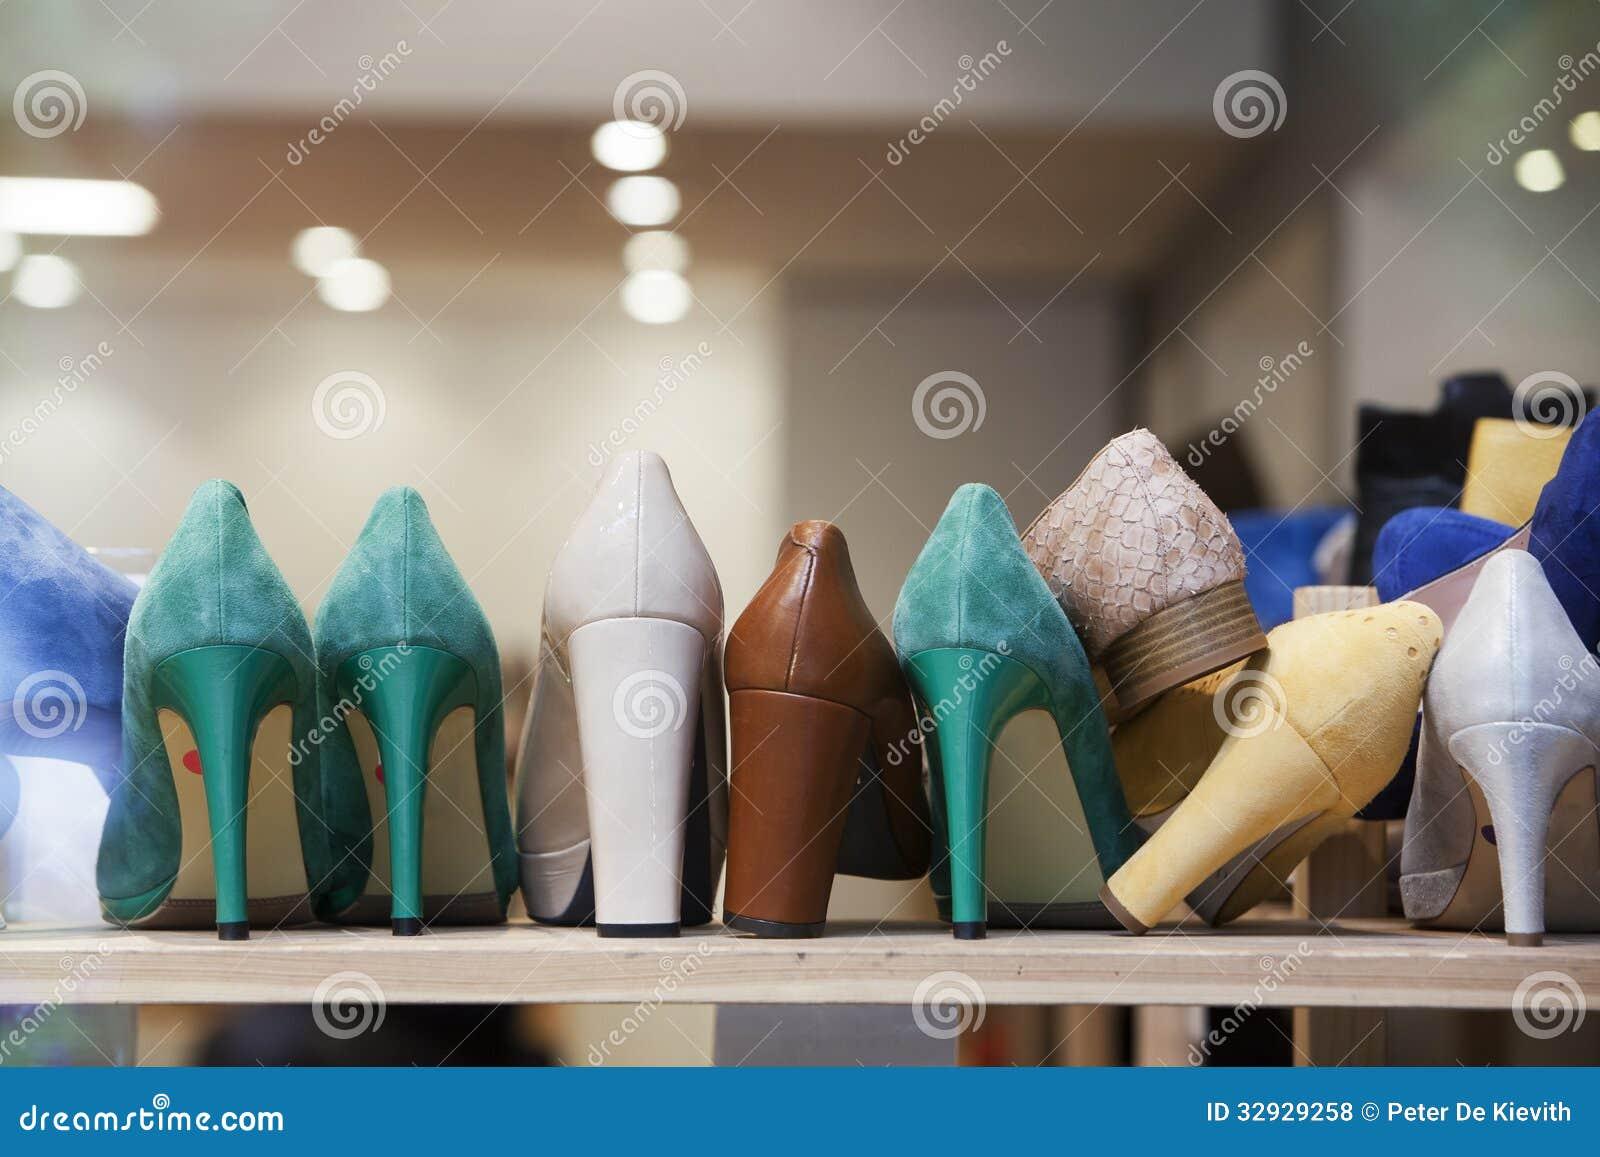 high-heels-shoe-store-just-ladies-closet-home-32929258.jpg